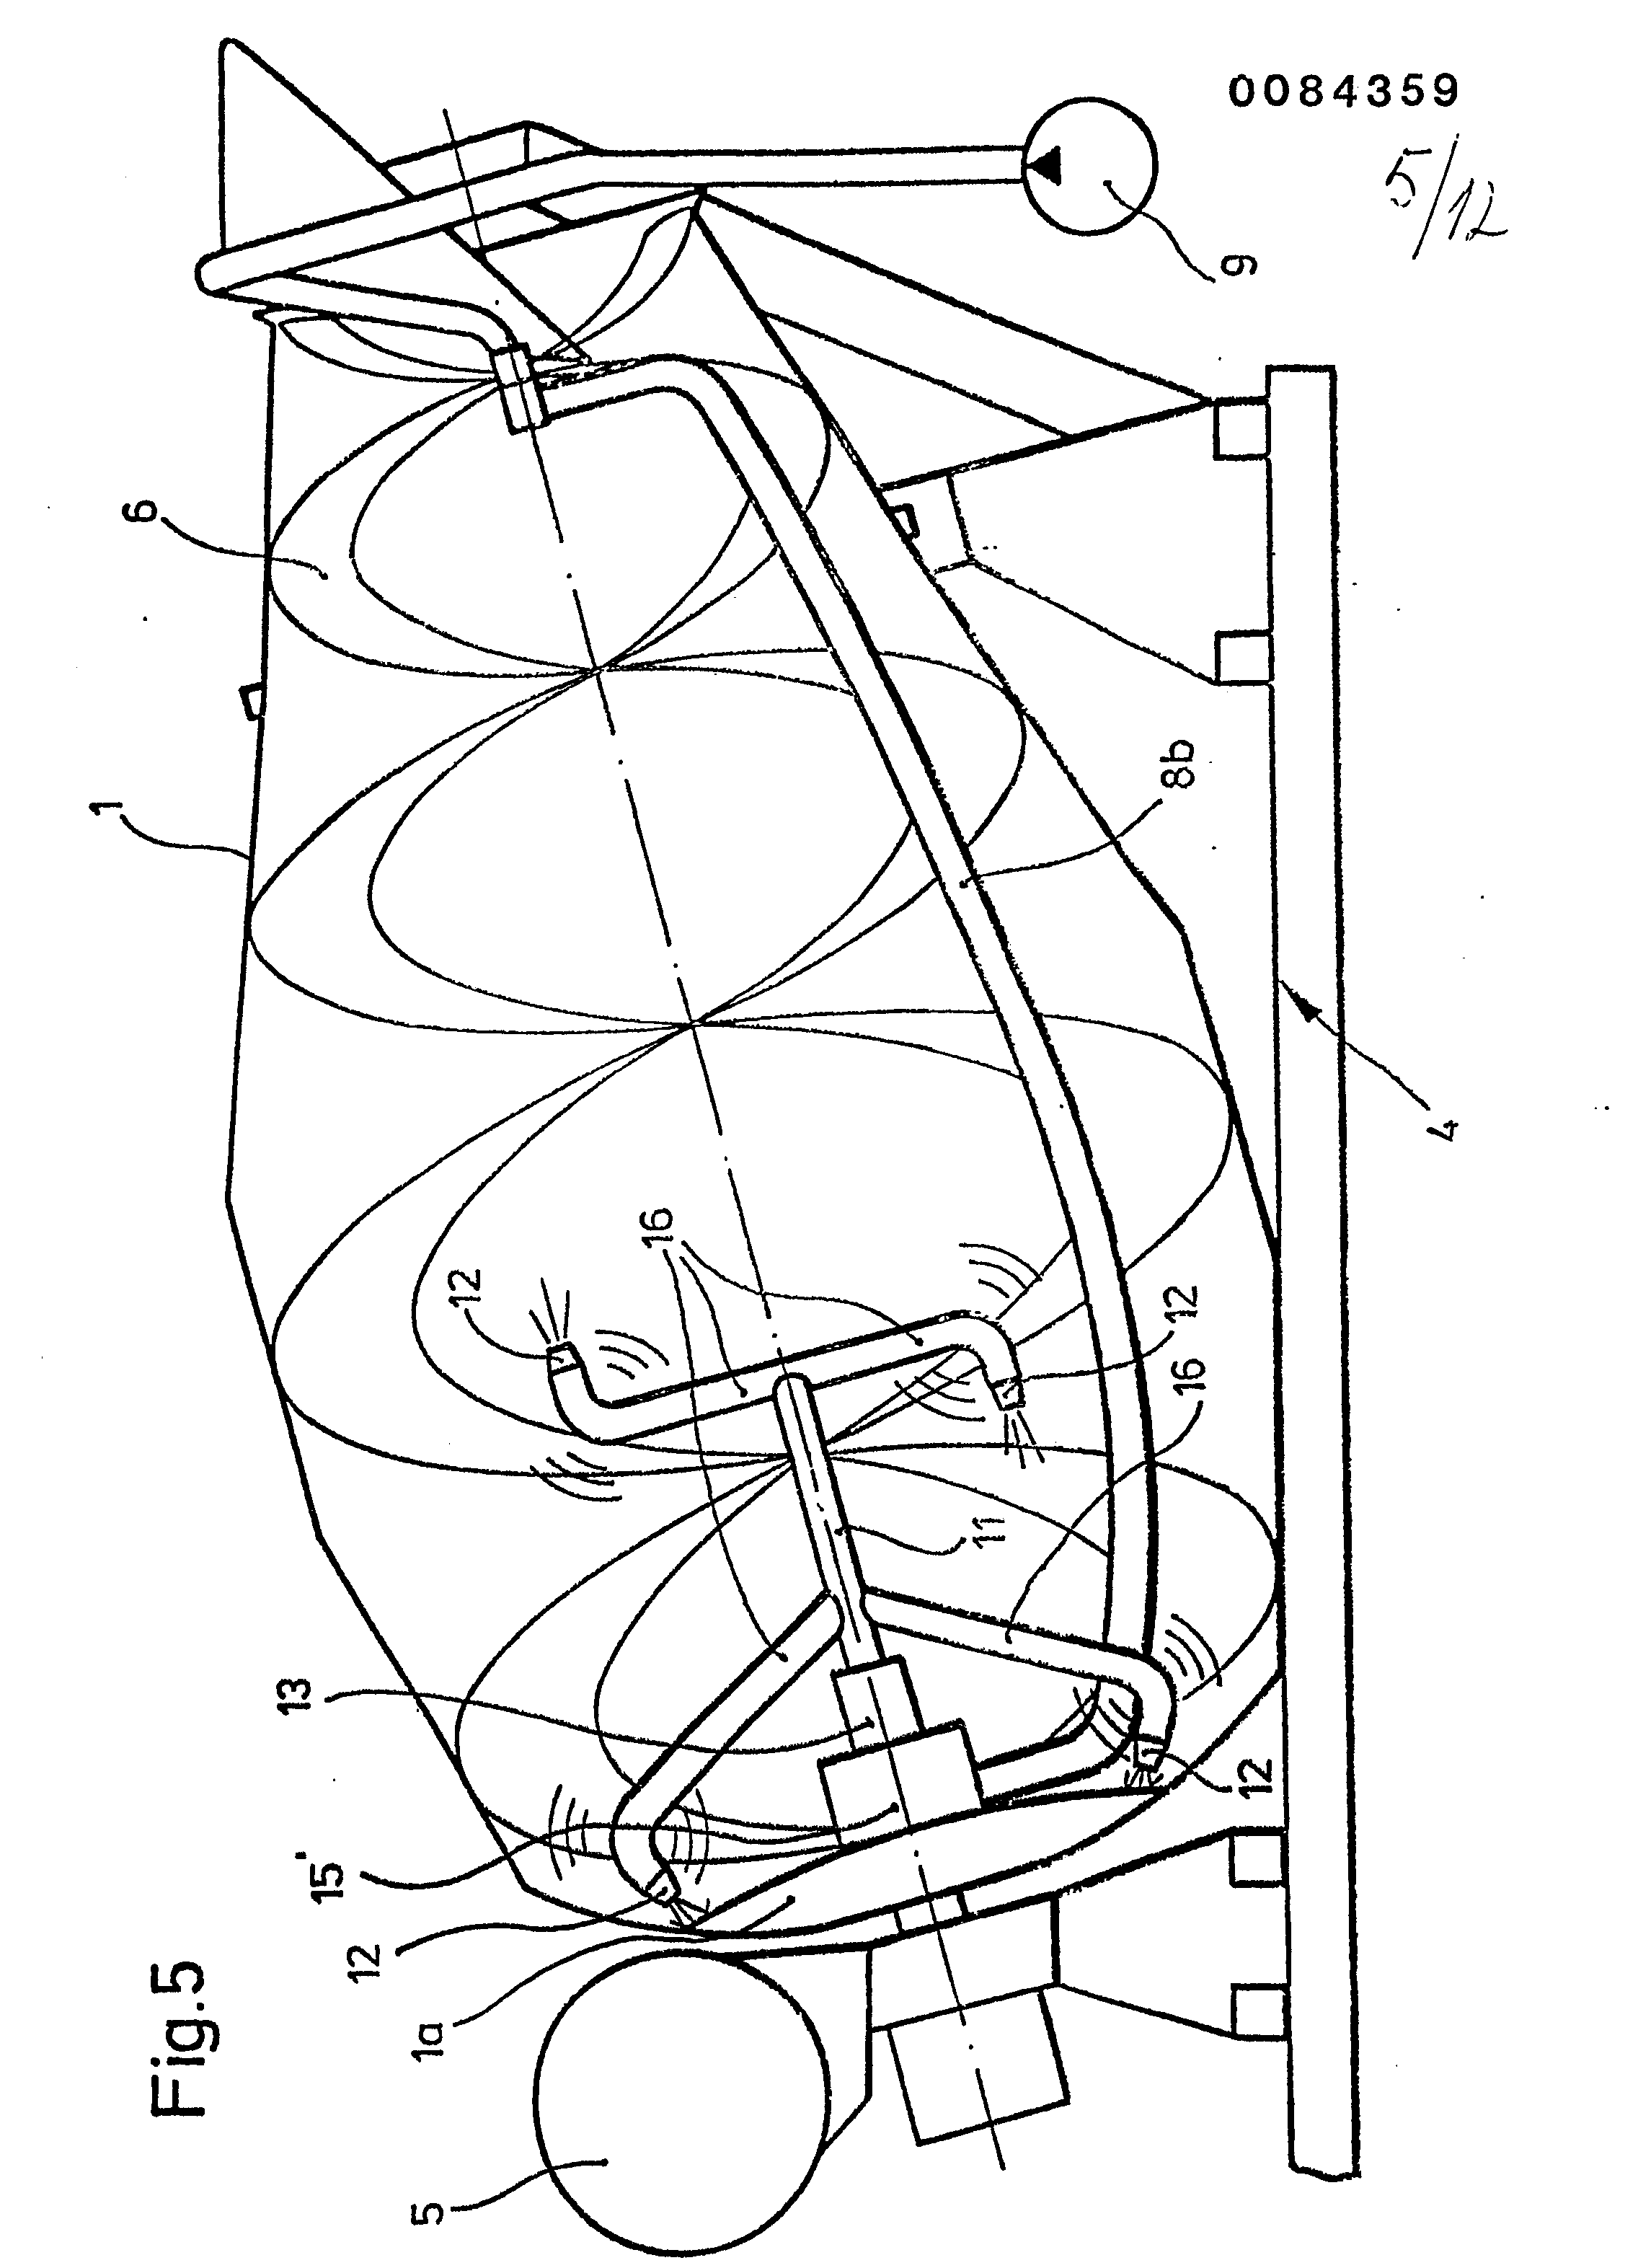 patent ep0084359a2 betonmischer mit vibrator google. Black Bedroom Furniture Sets. Home Design Ideas